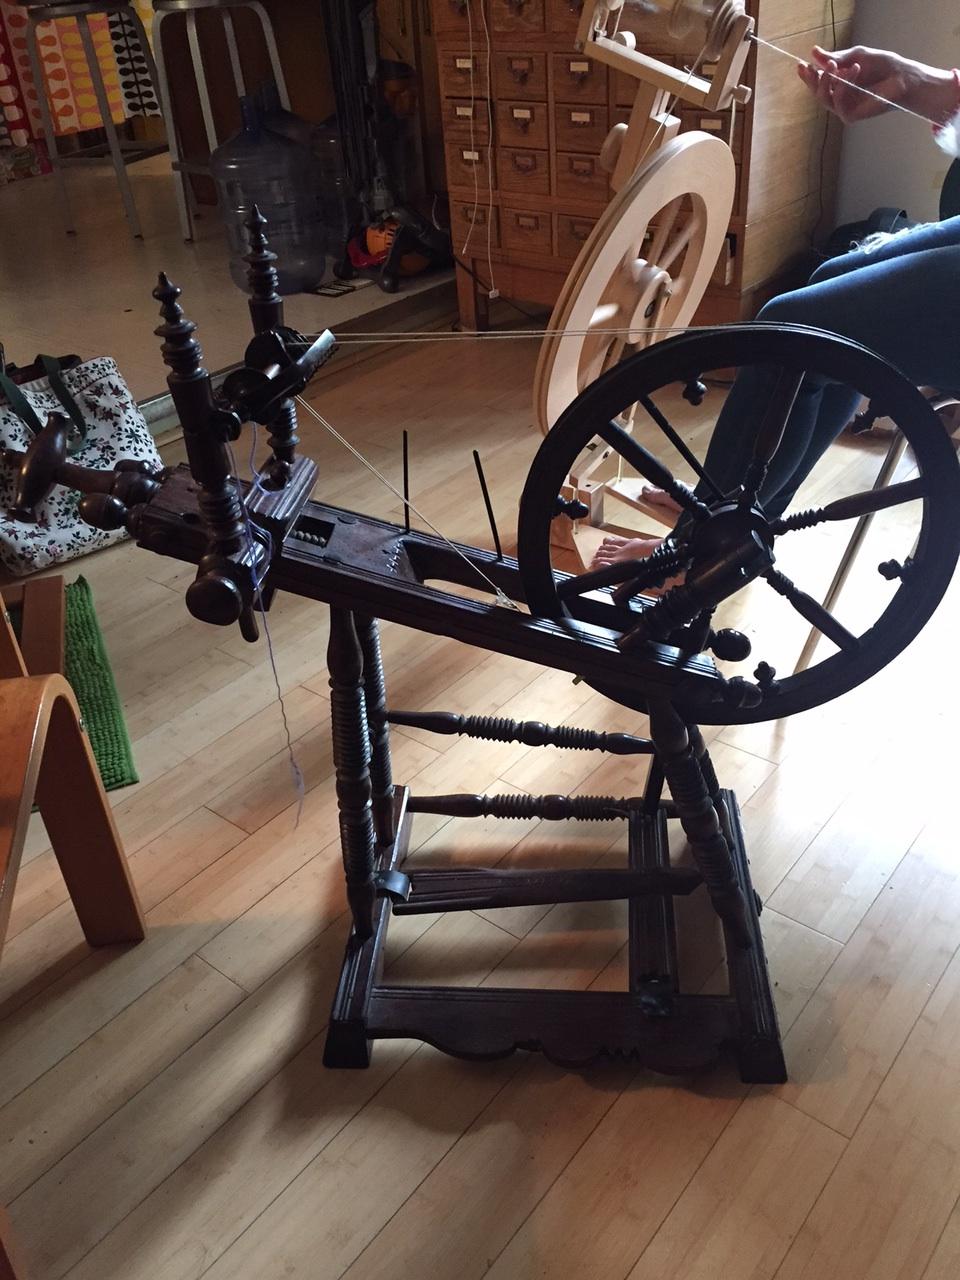 The spinning savant's antique wheel